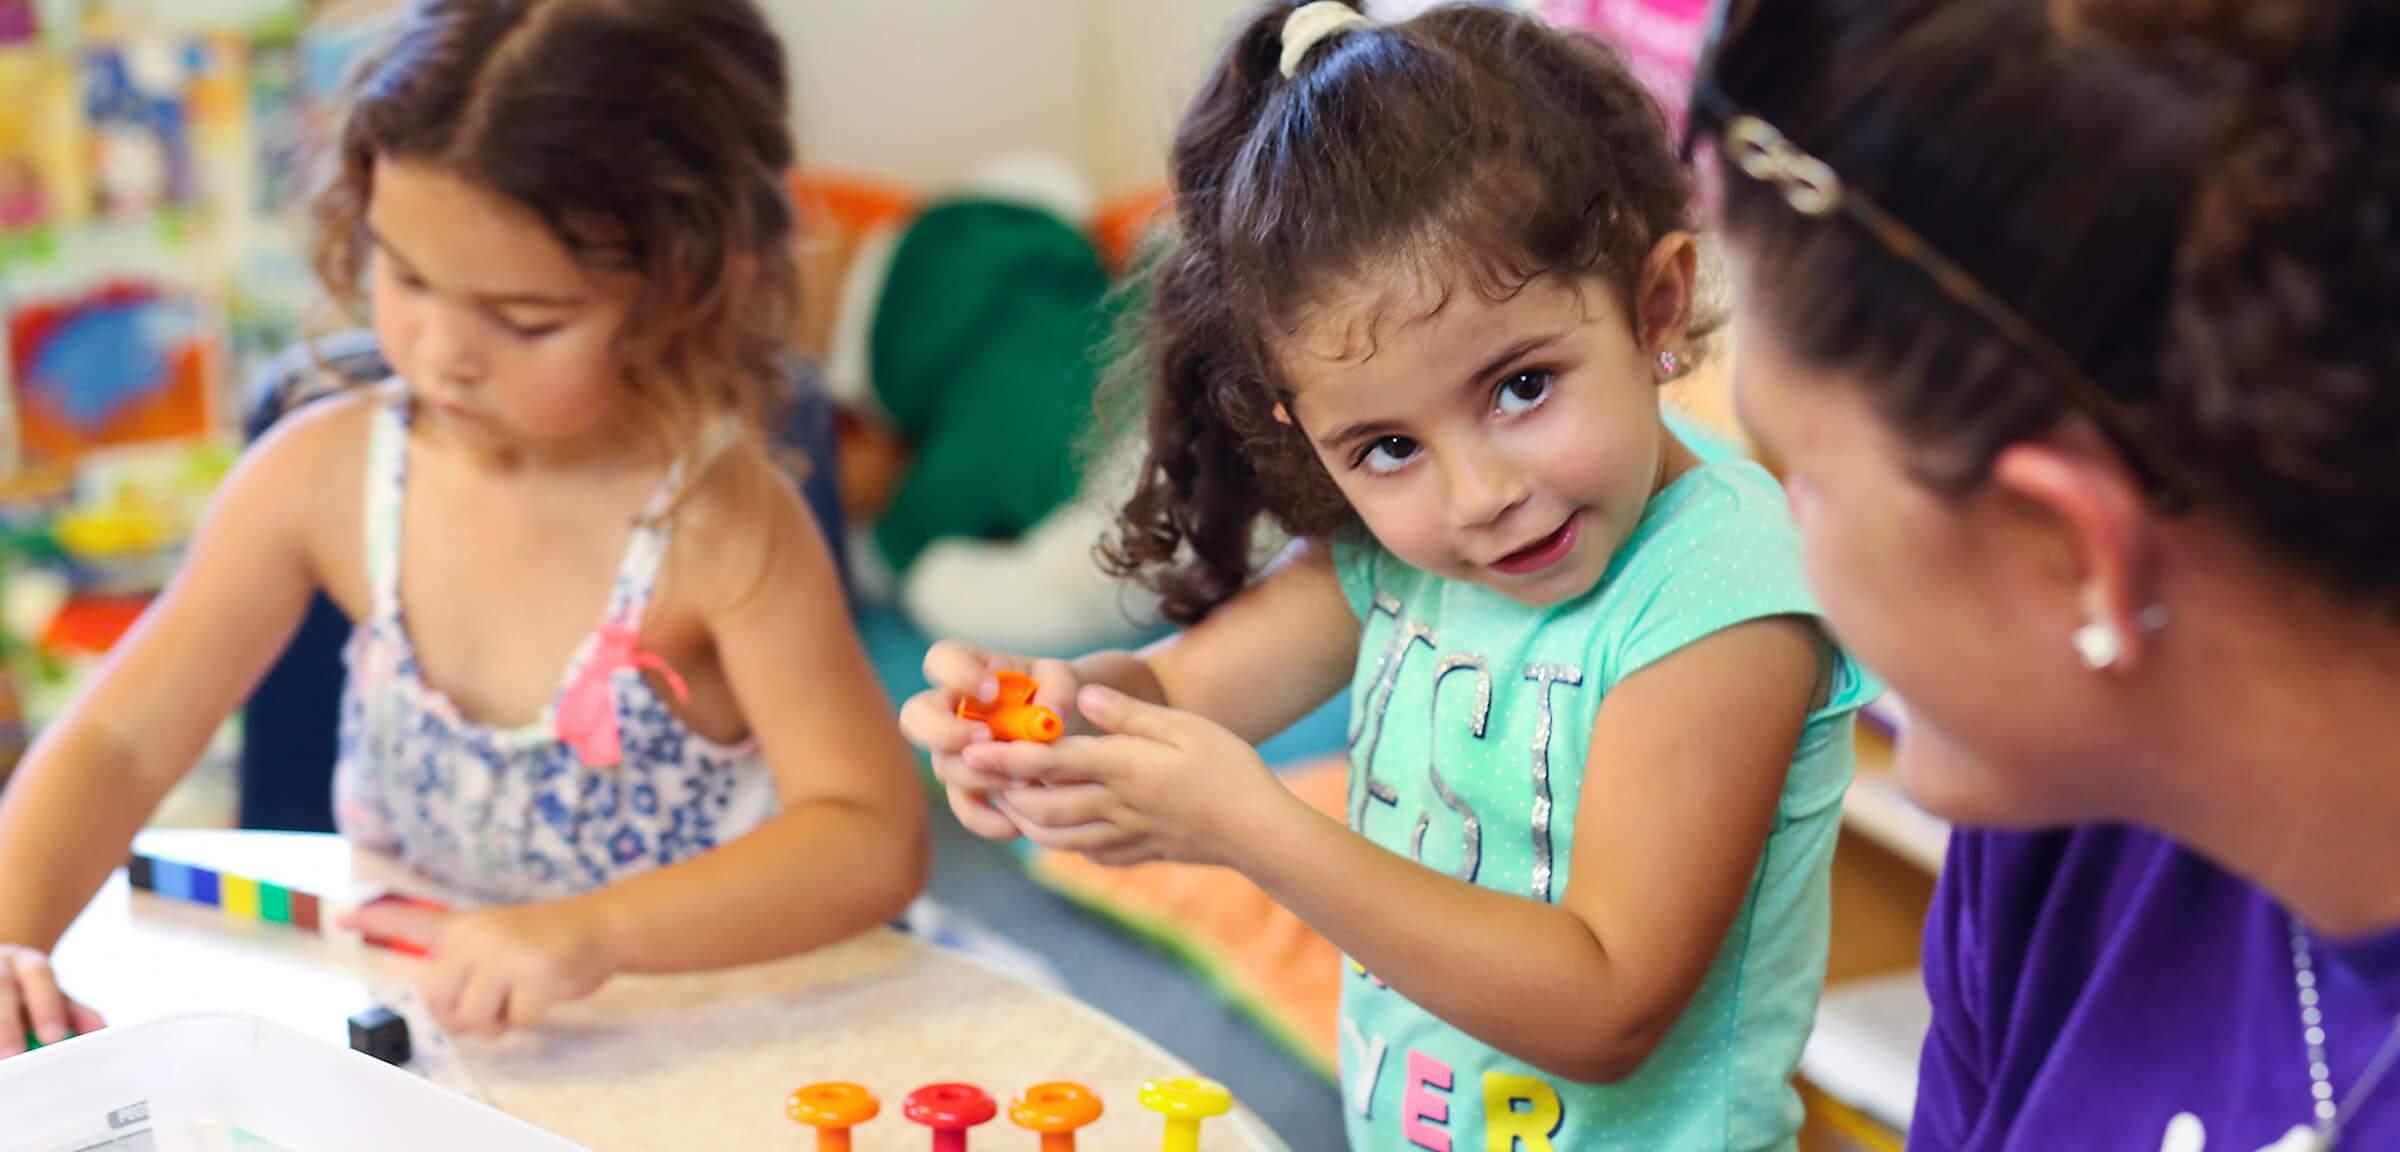 Two children and teacher at our preschool in Alpharetta